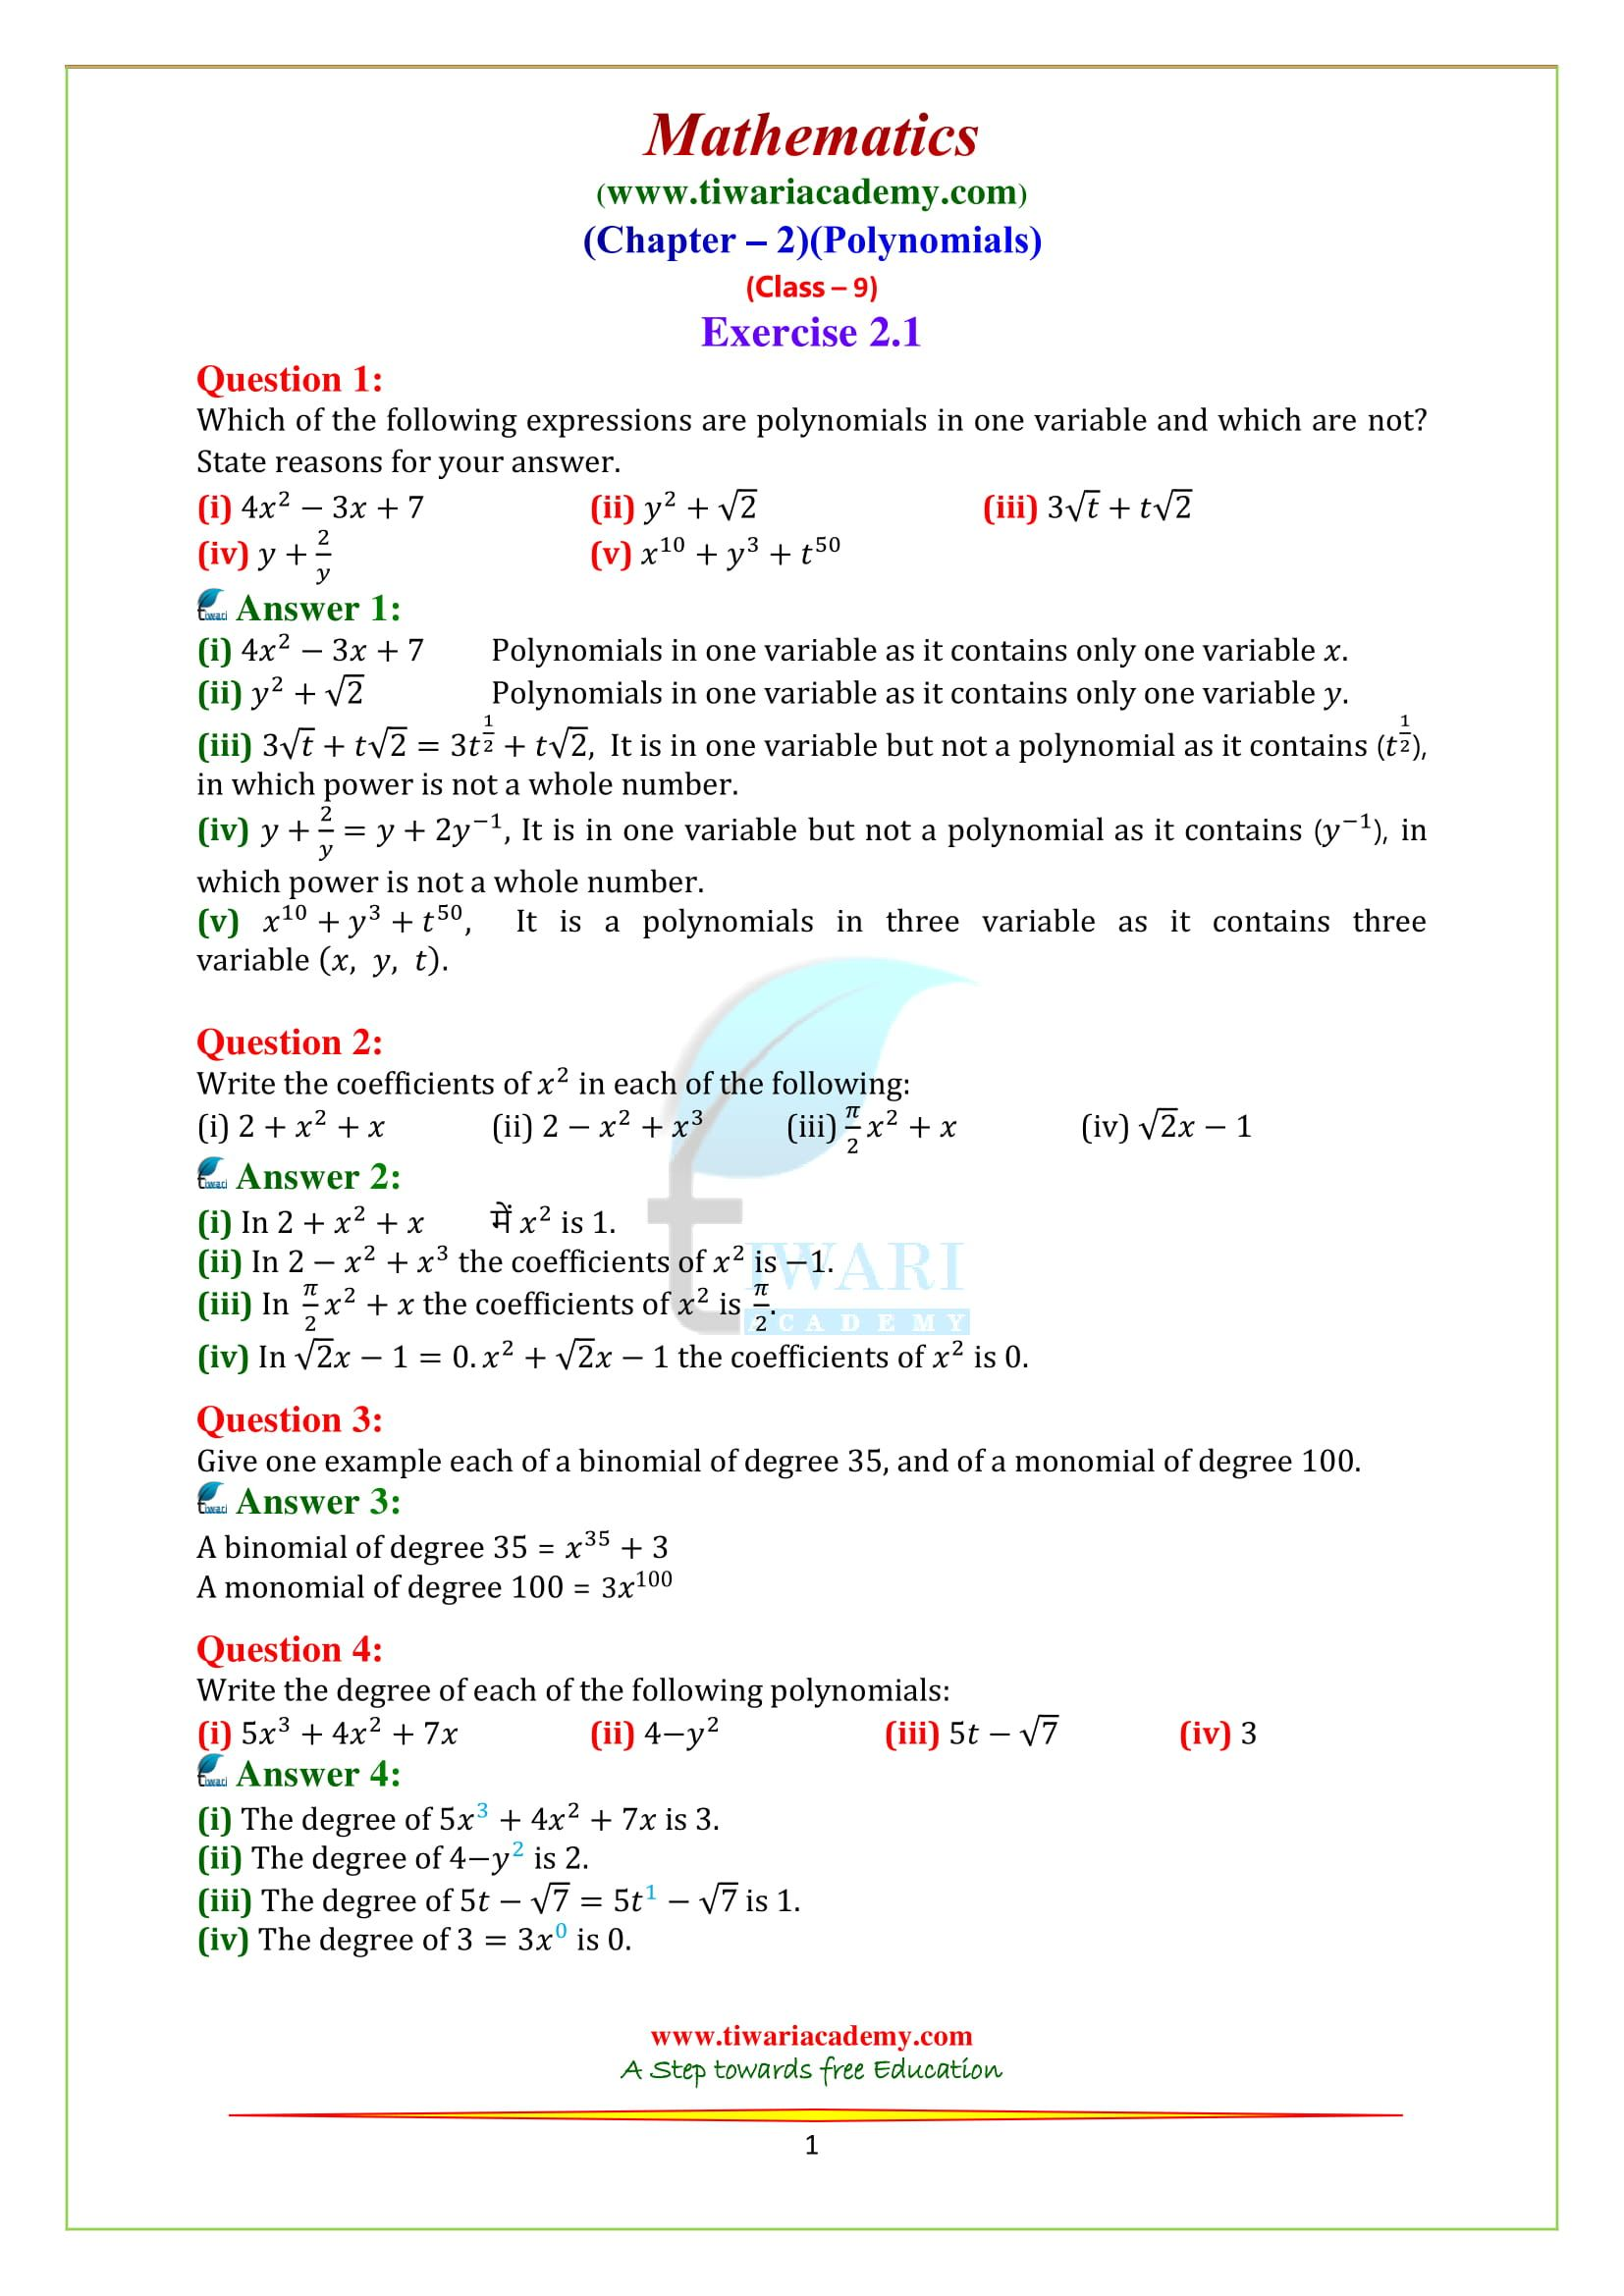 Ncert Solutions For Class 9 Maths Chapter 2 Exercise 2 1 Maths